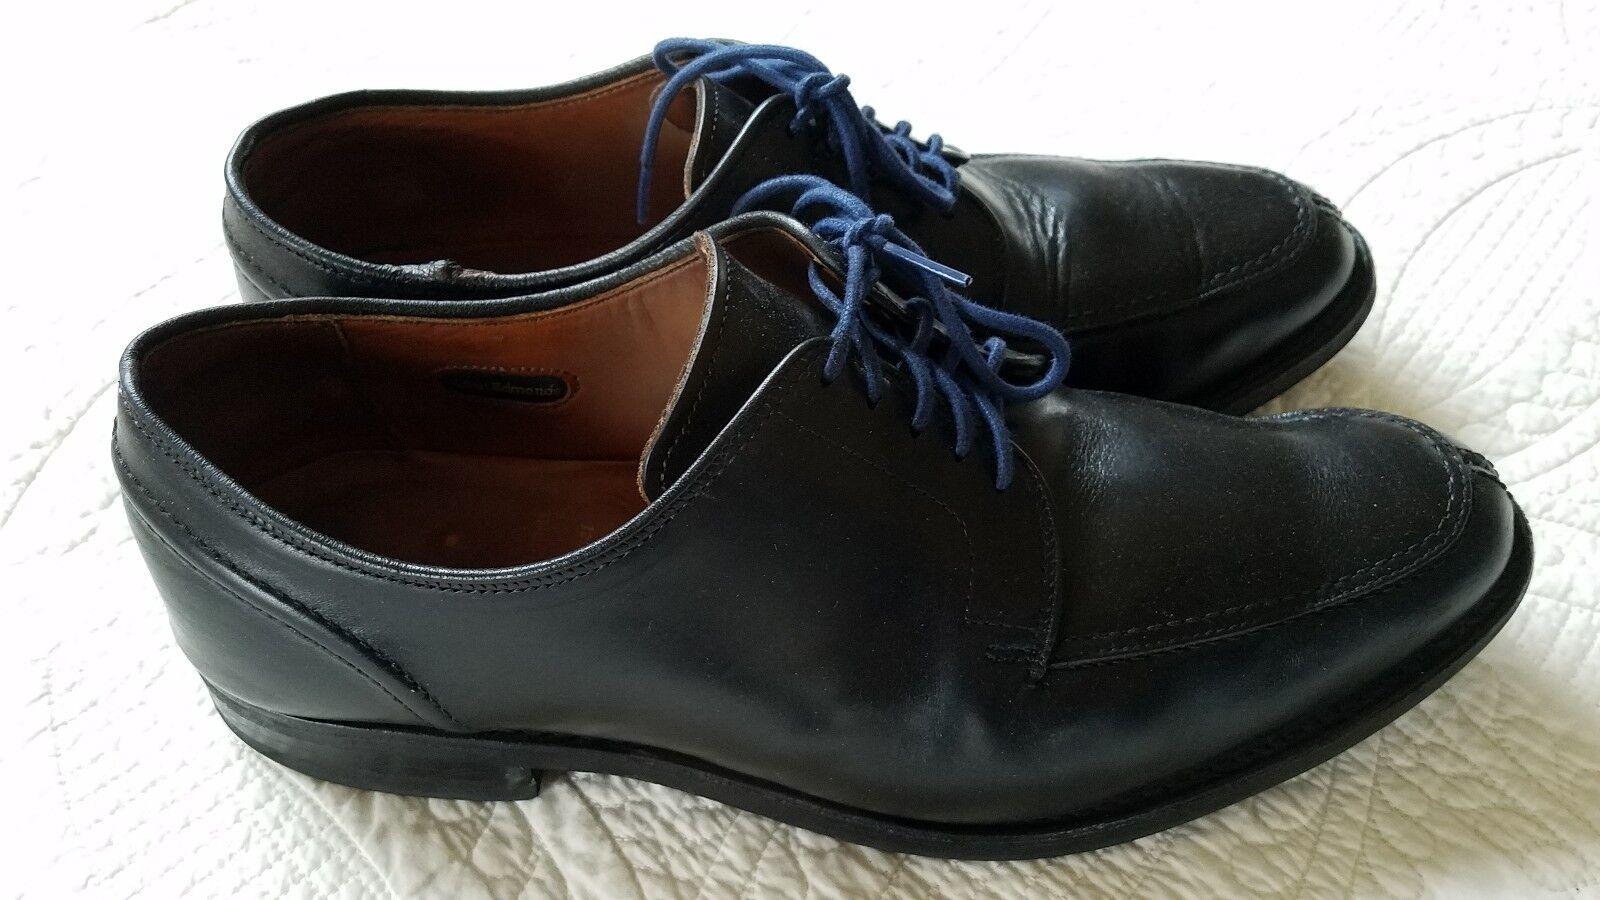 Allen Edmonds Clark Street Oxford shoes Men's Size 10 Made In USA